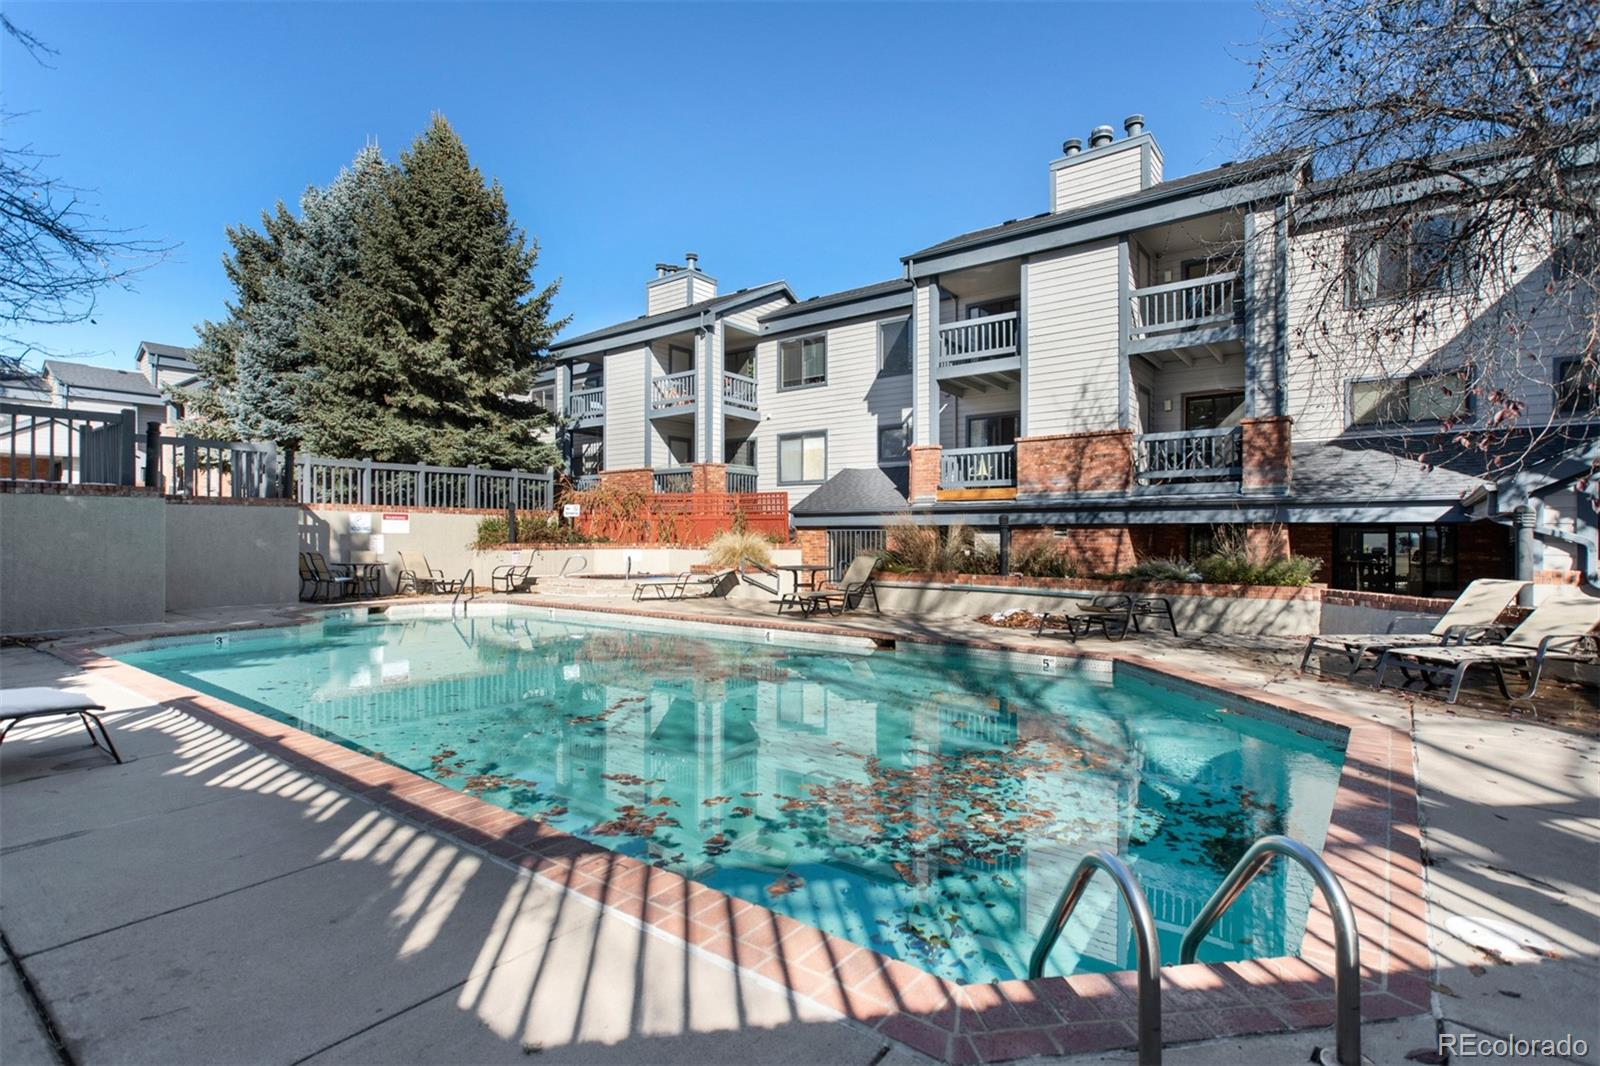 MLS# 3826145 - 17 - 2727 Folsom Street #123, Boulder, CO 80304